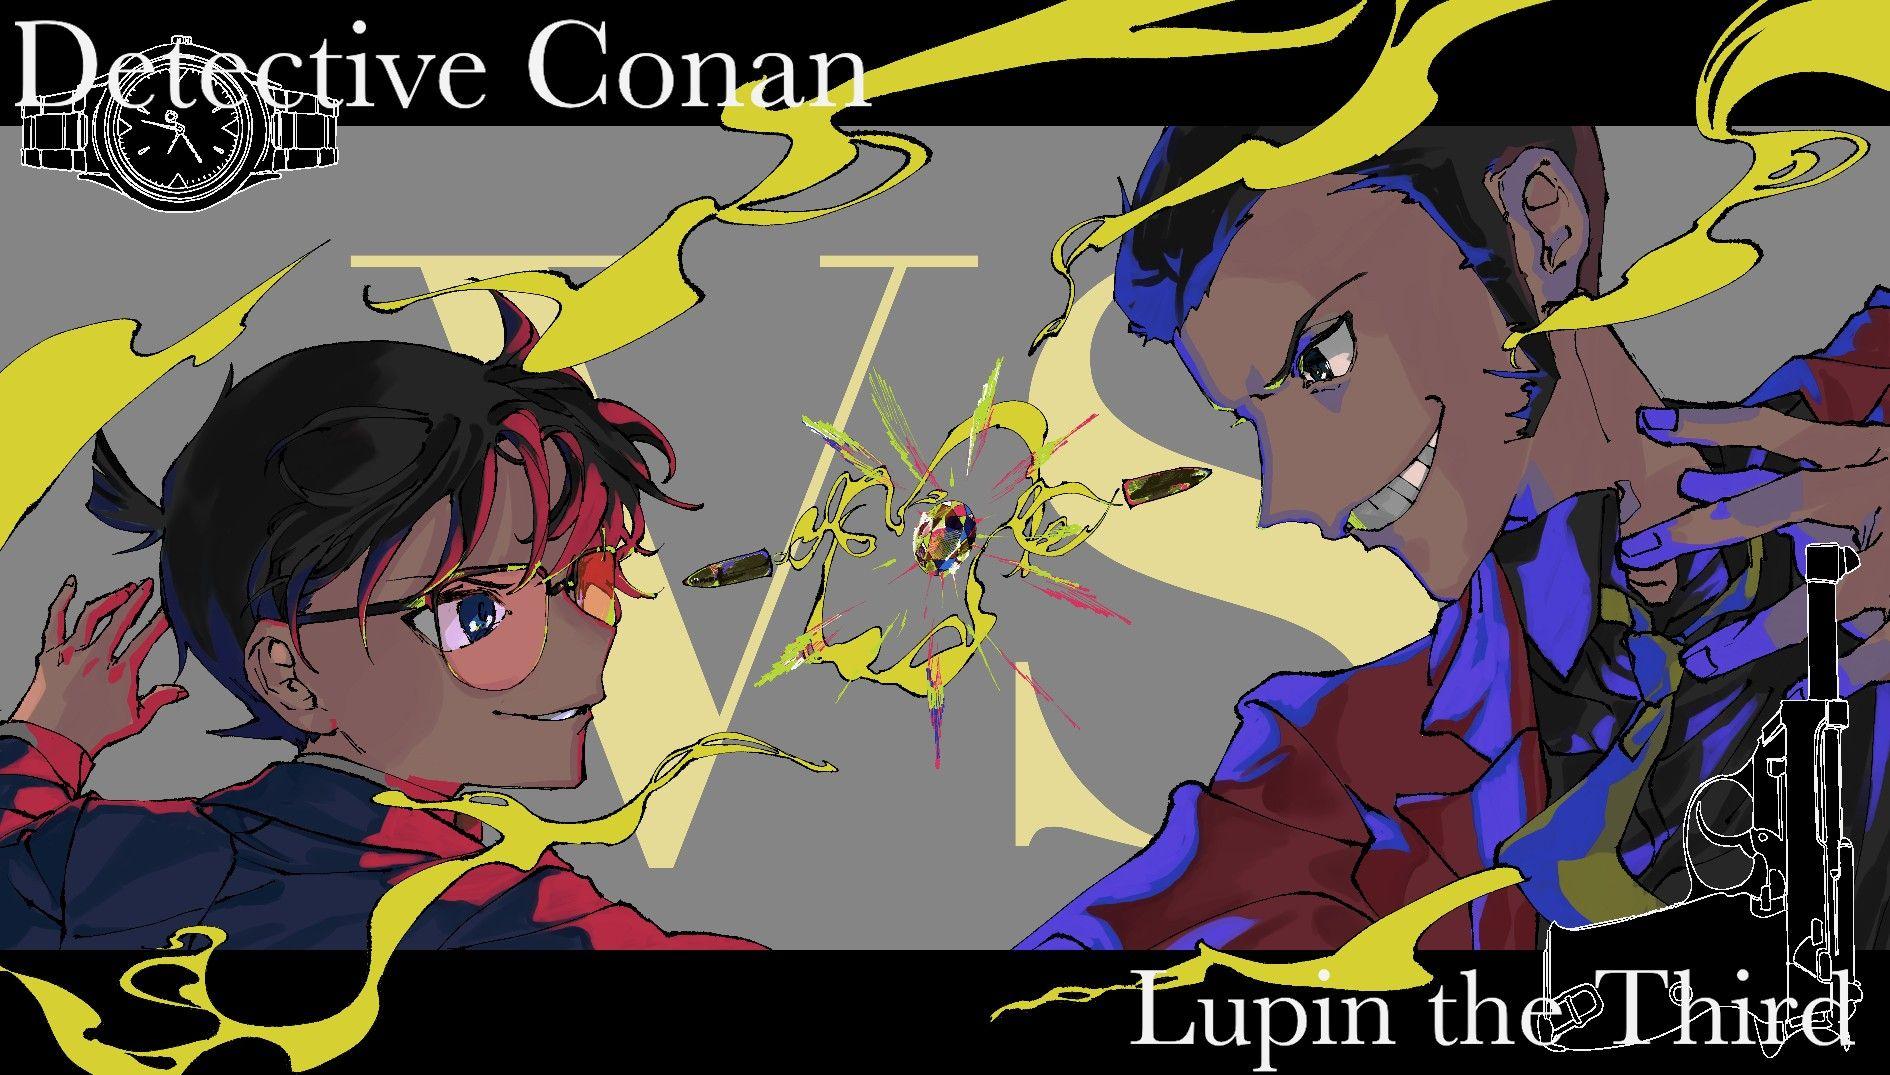 Pin by 🌟IVA🌟 on Detective conan ⚽& kaito kid Detective